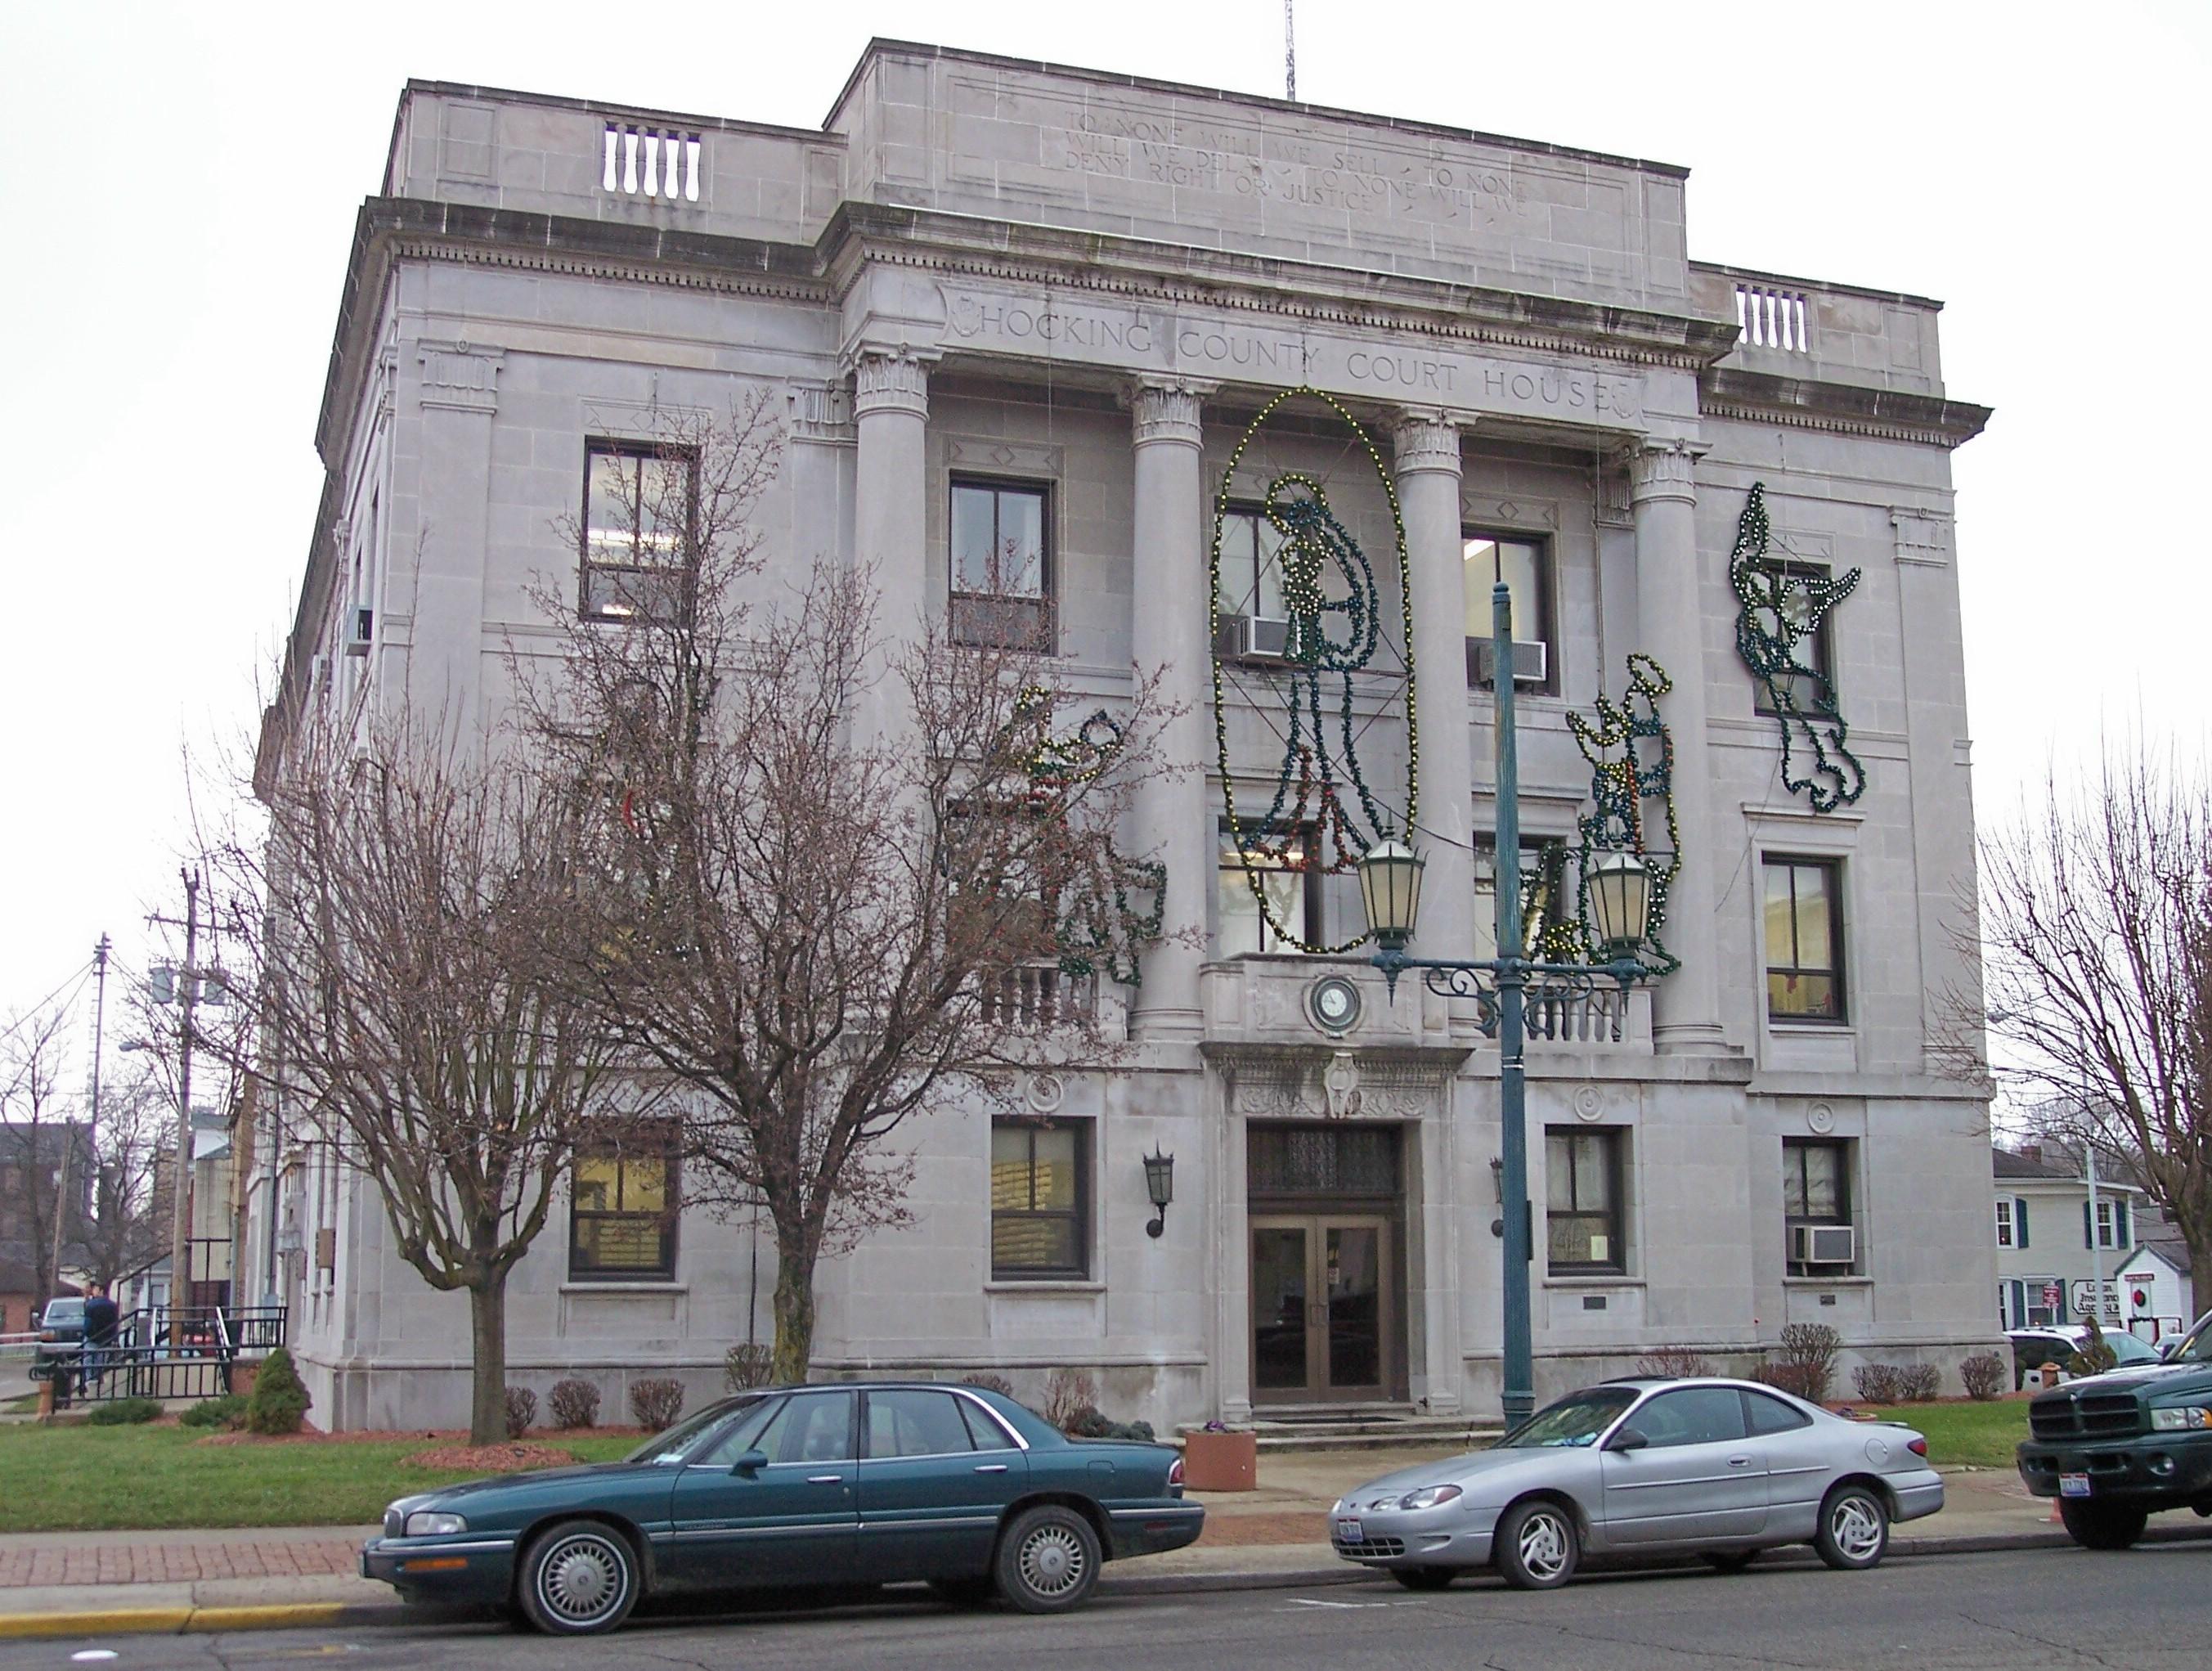 Hocking County, Ohio - Wikipedia